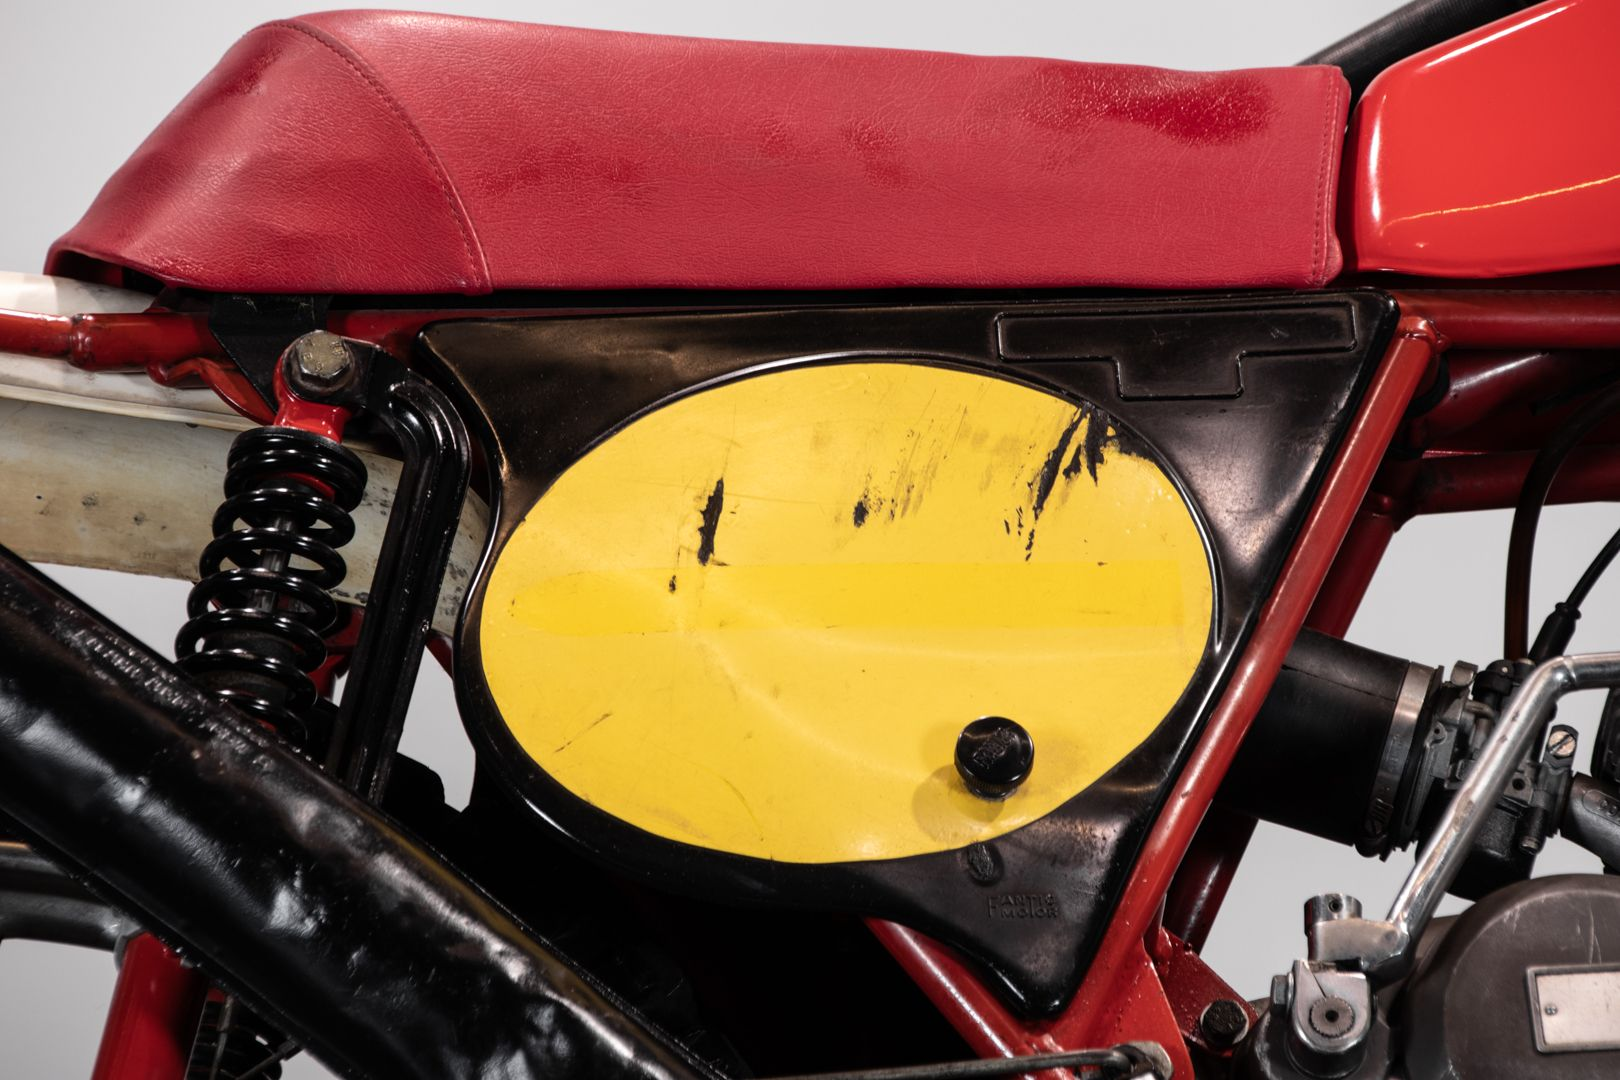 1975 Fantic Motor Caballero Reg. 50 4M TX 290 64502